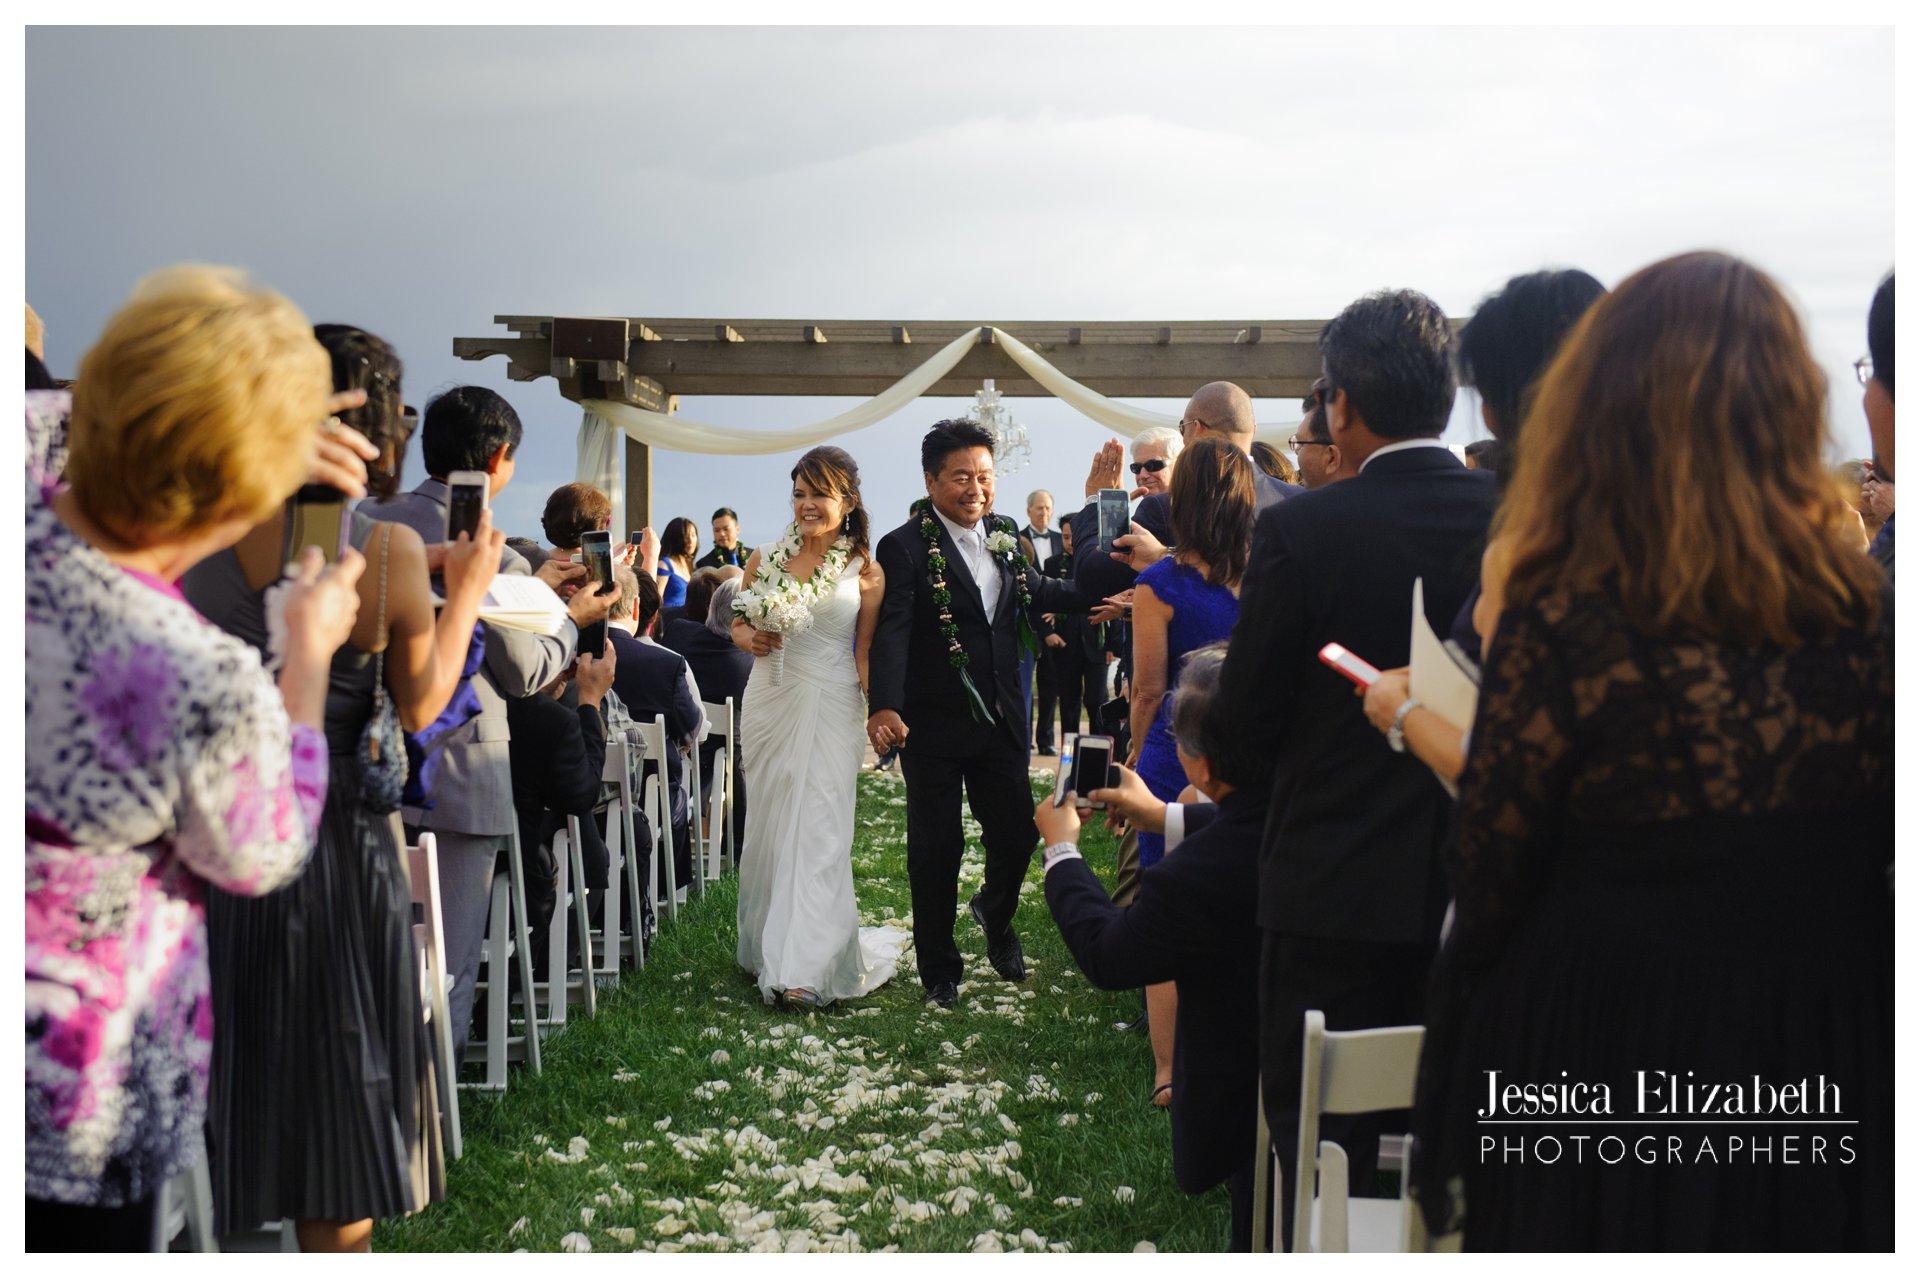 26-Terranea-Palos-Verdes-Wedding-Photography-by-Jessica-Elizabeth-w.jpg